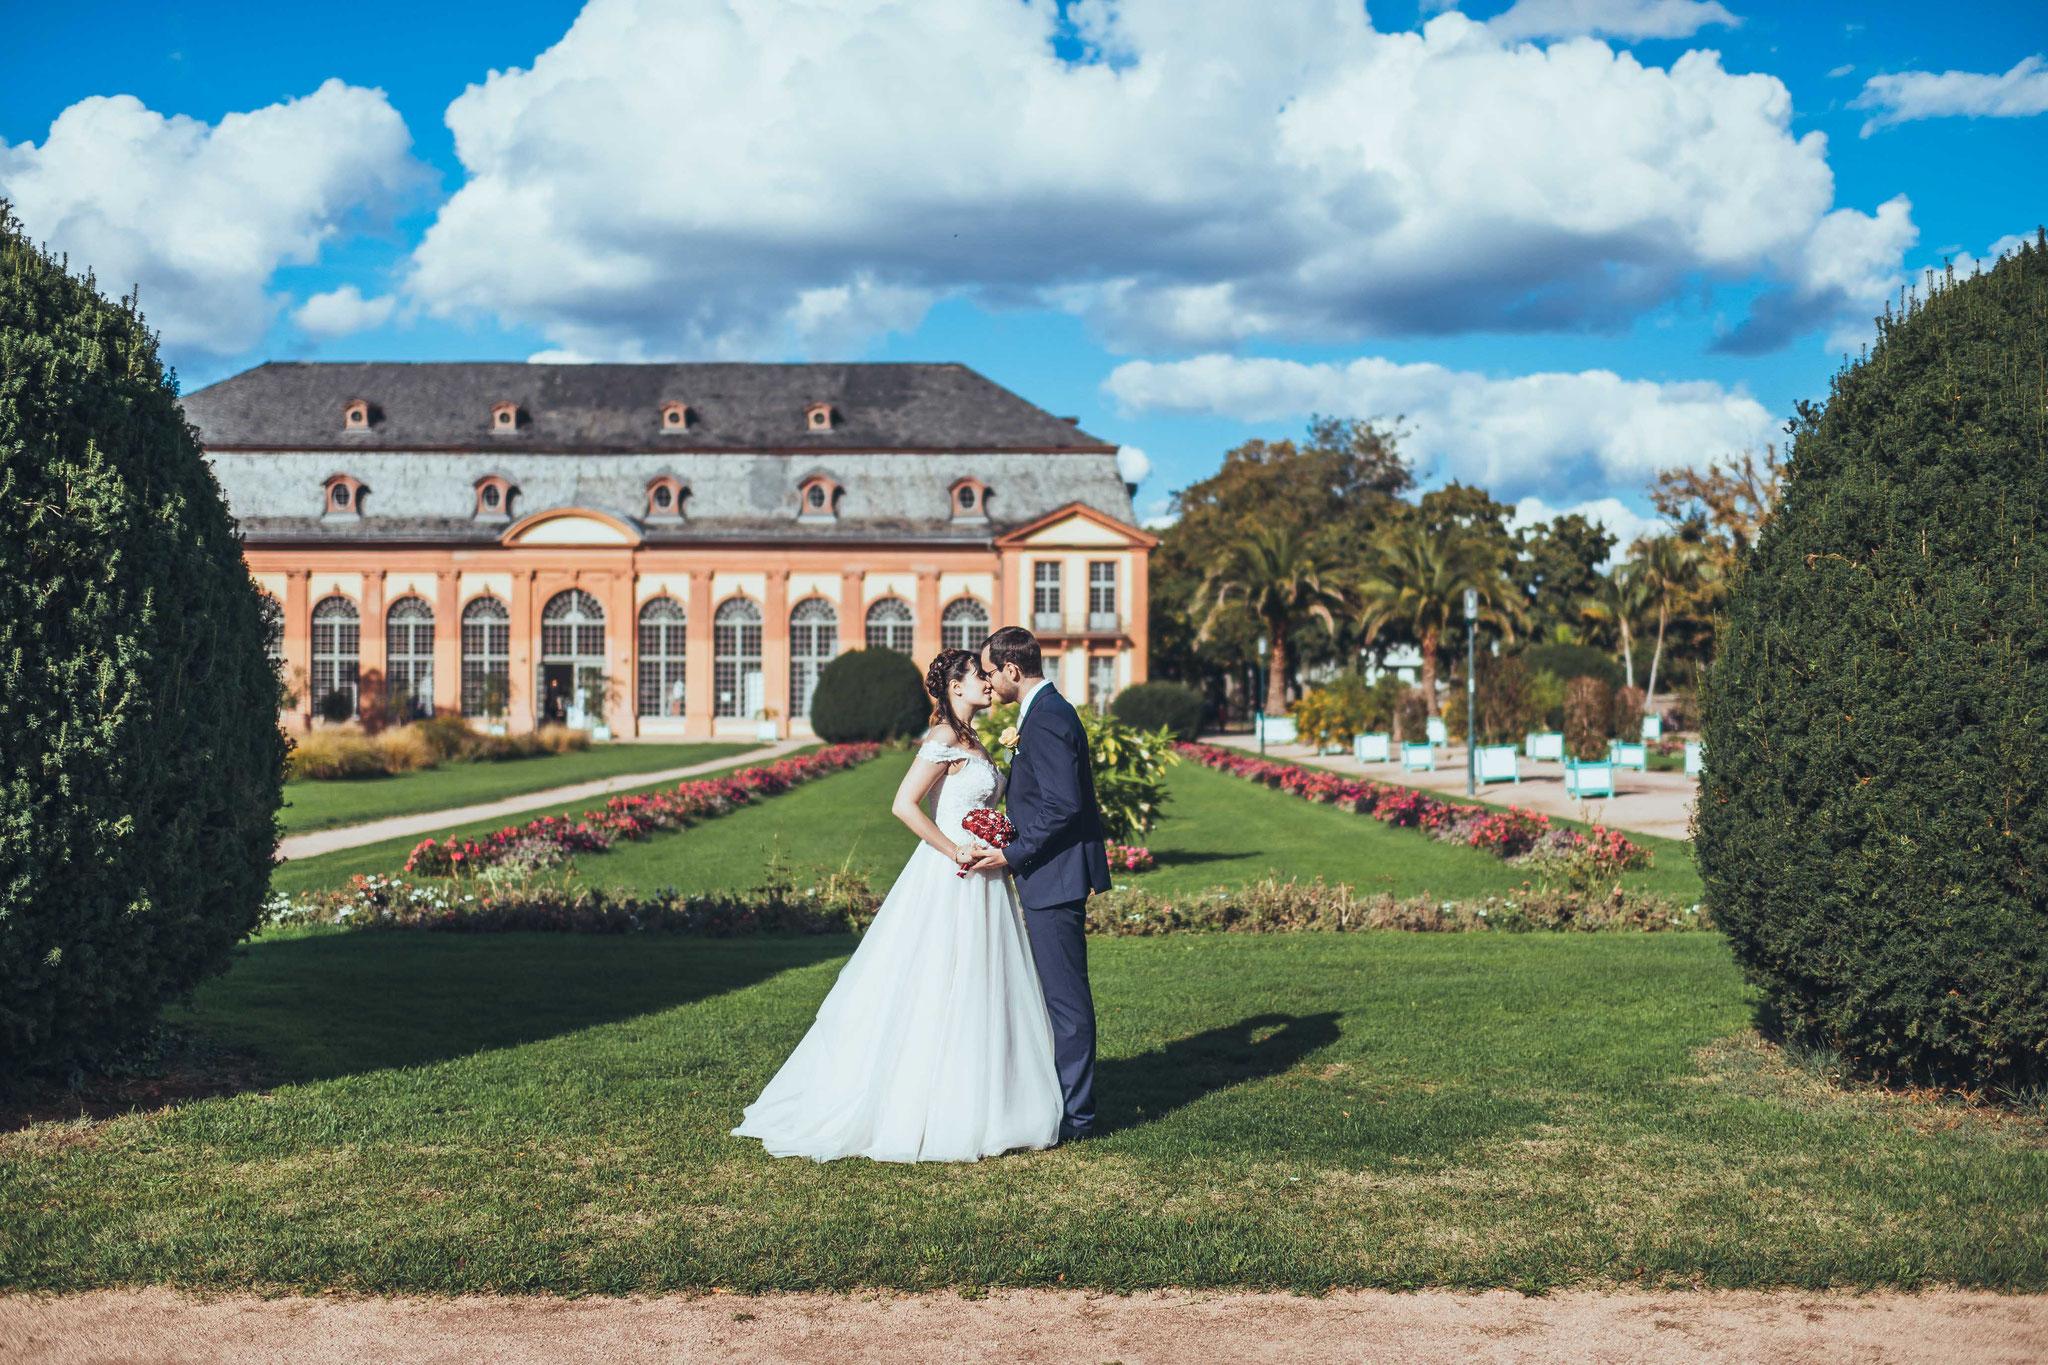 Brautpaar Shooting im Orangerie Garten in Darmstadt